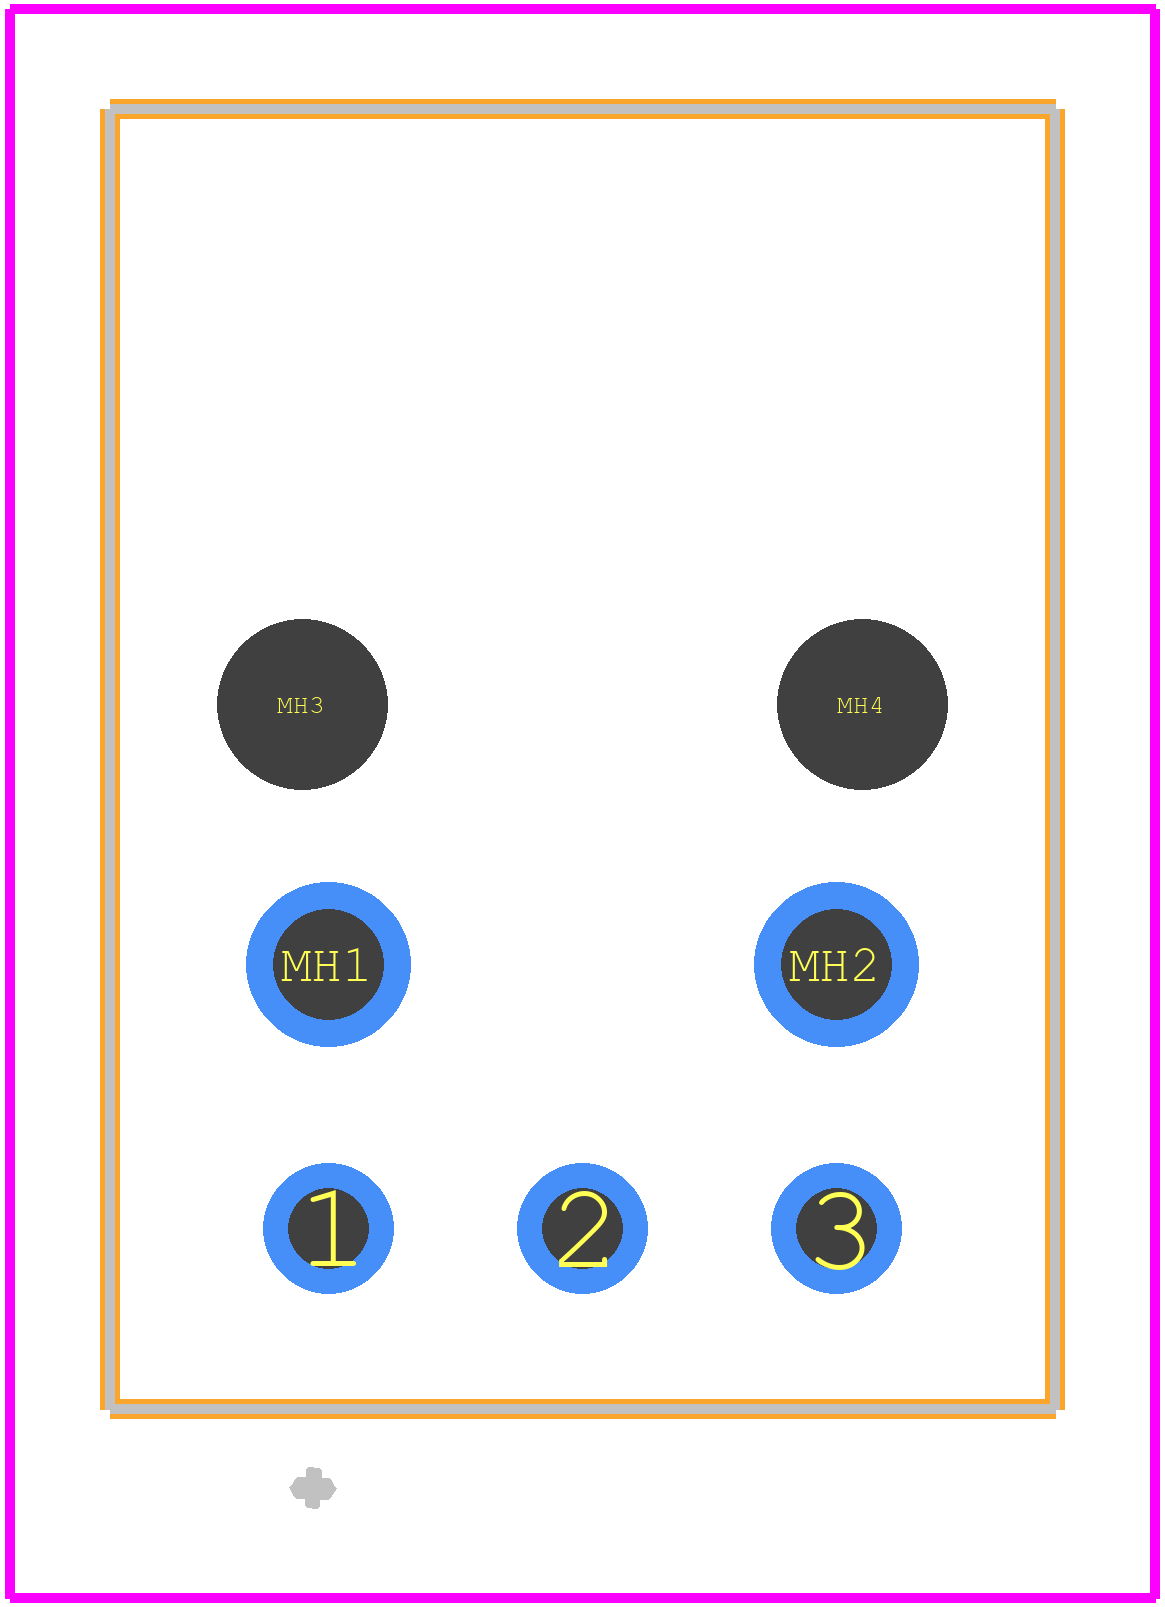 FC684208T - CLIFF ELECTRONIC COMPONENTS - PCB Footprint & Symbol ...